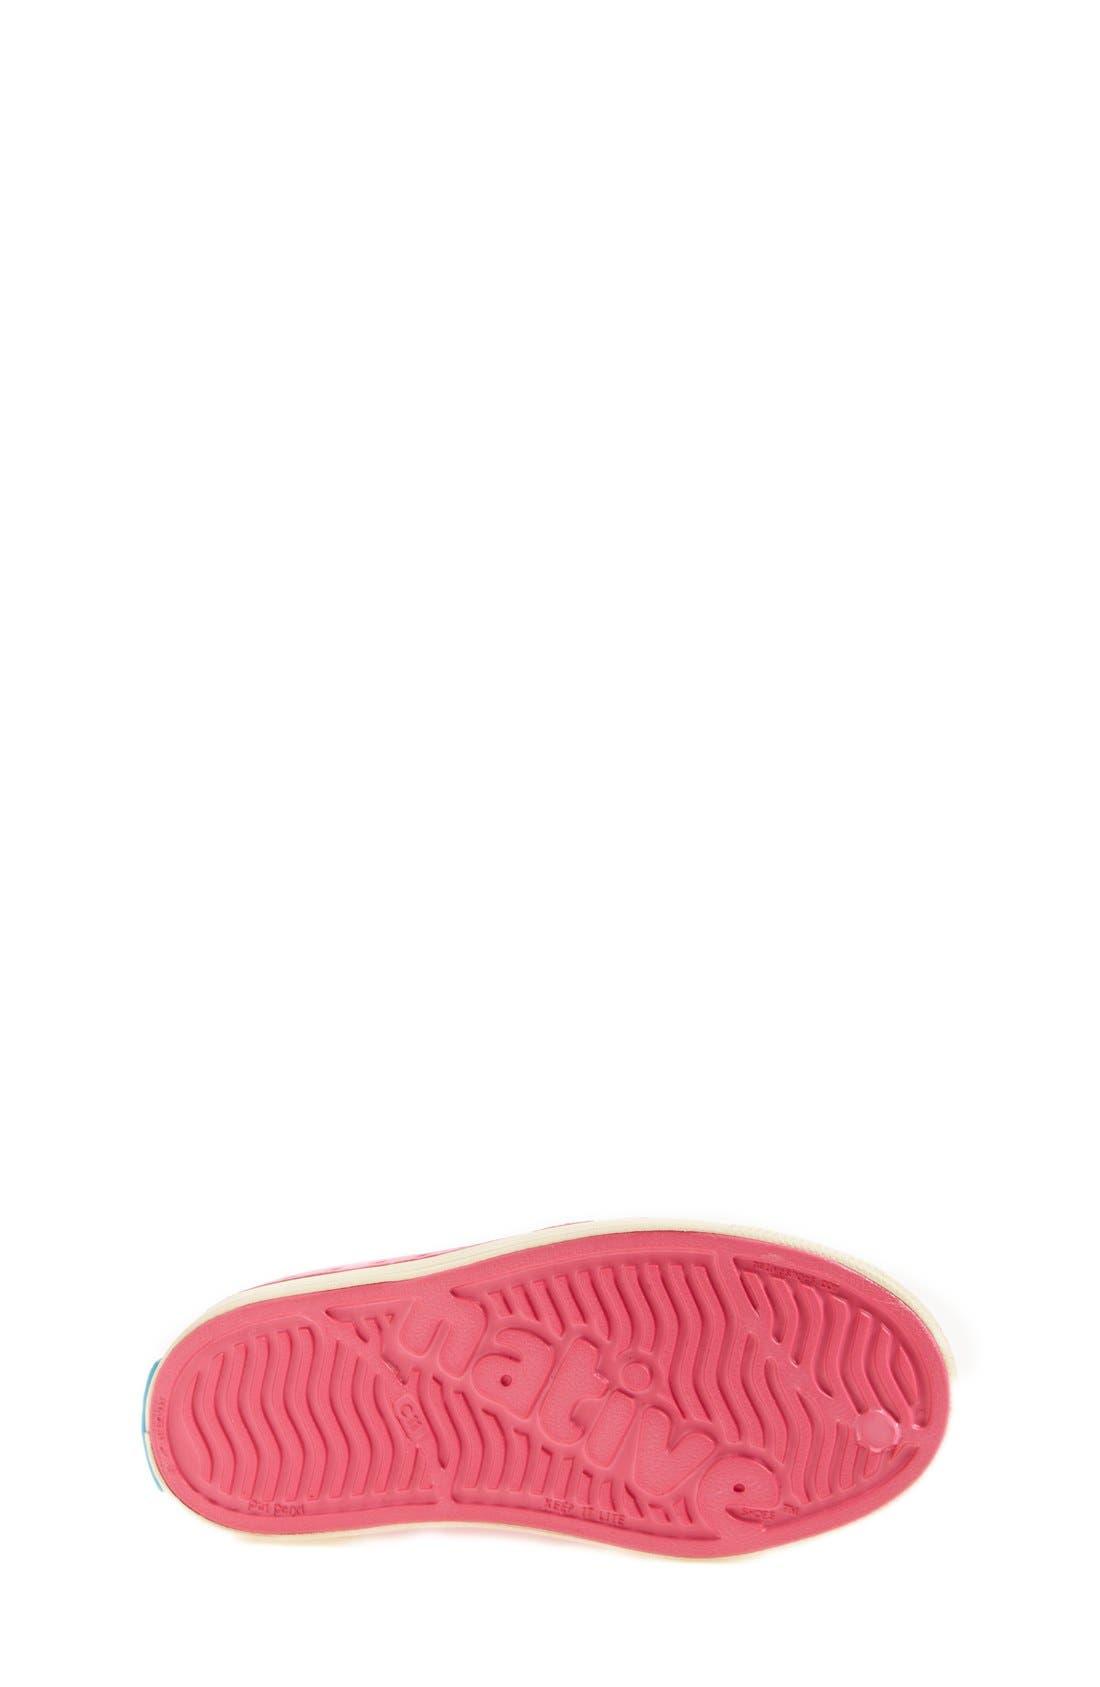 'Jefferson' Water Friendly Slip-On Sneaker,                             Alternate thumbnail 219, color,